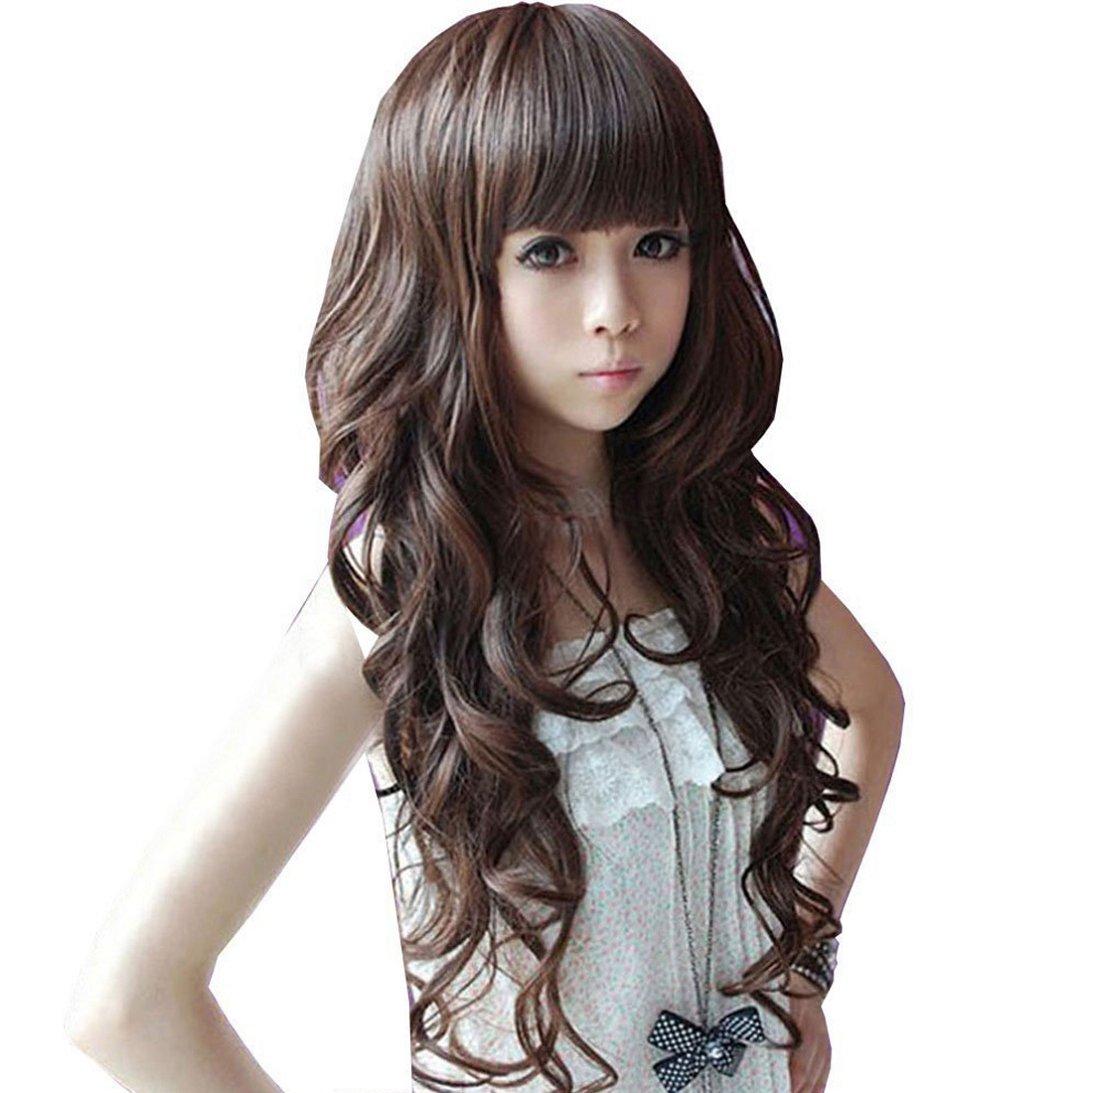 Amazon.com: Sunward Fashion Womens Girls Dark Brown Wavy Curly Long Hair Human Wig+wig Cap: Home & Kitchen